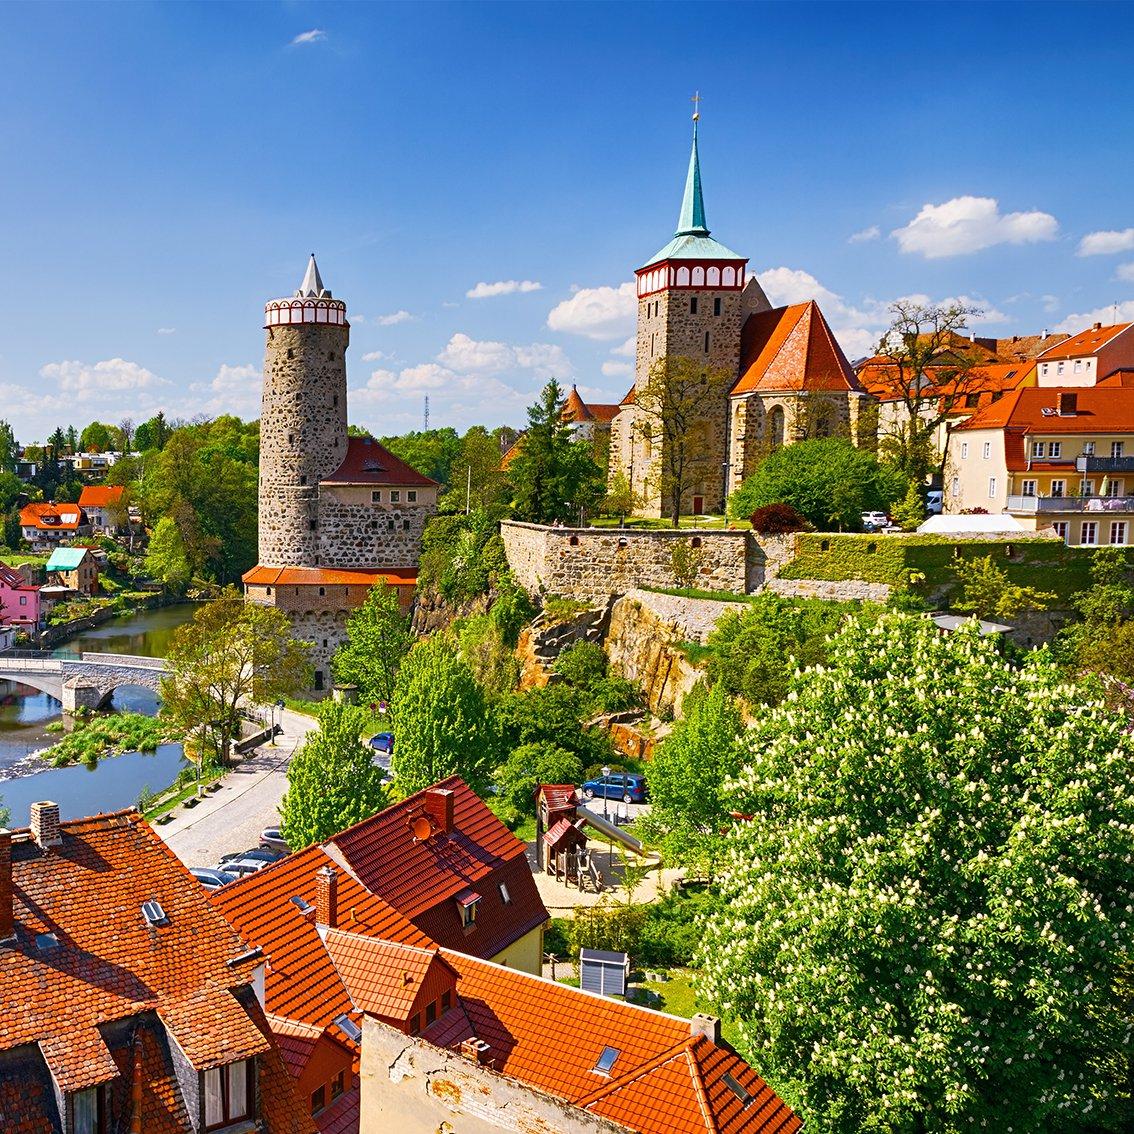 LausitzCar Bautzen- mit uns ans Ziel